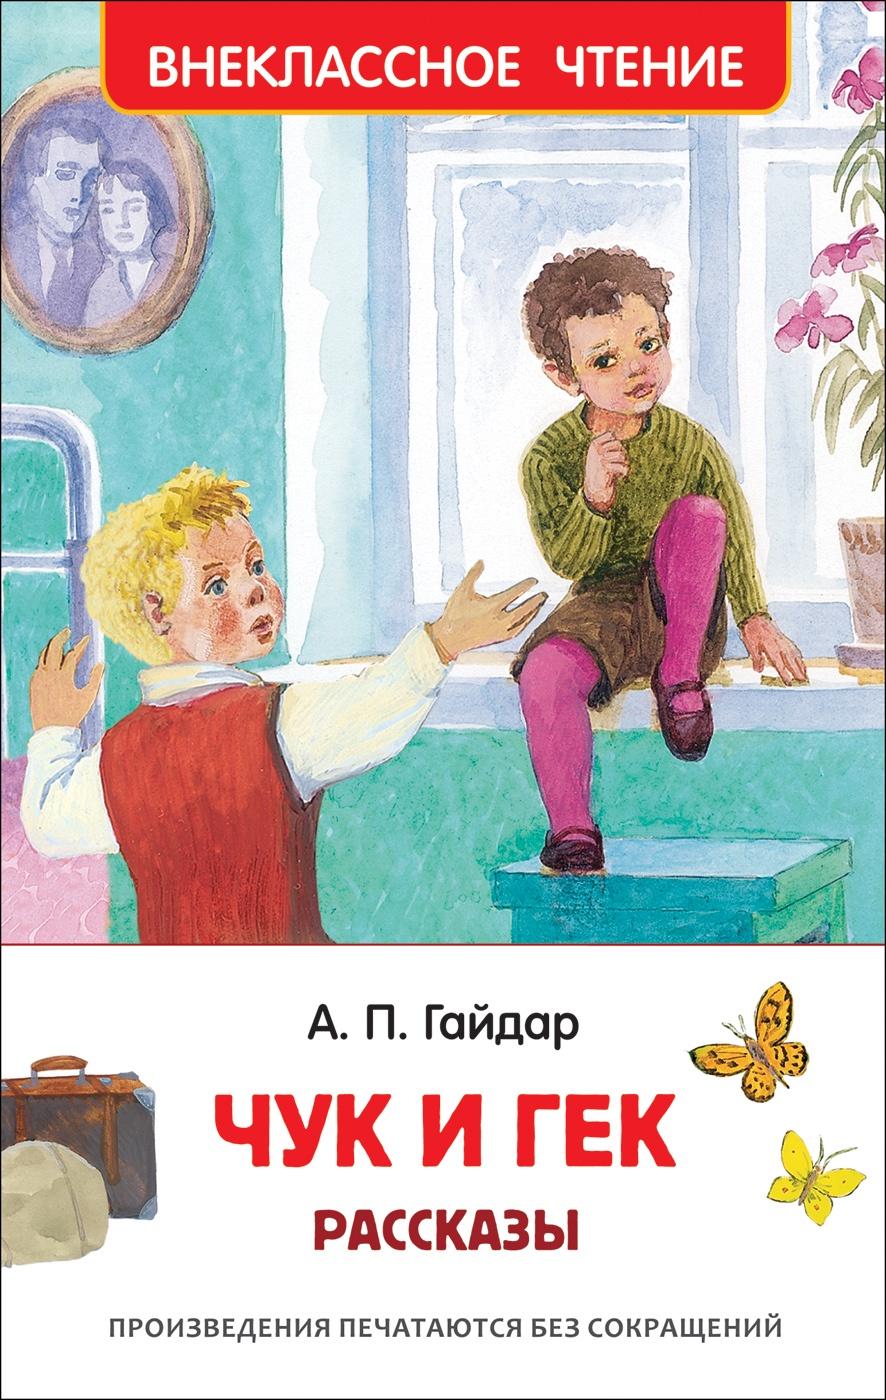 Гайдар А.П. Гайдар А.П. Чук и Гек. Рассказы (Внеклассное чтение) гайдар а клятва тимура киносценарий рассказы